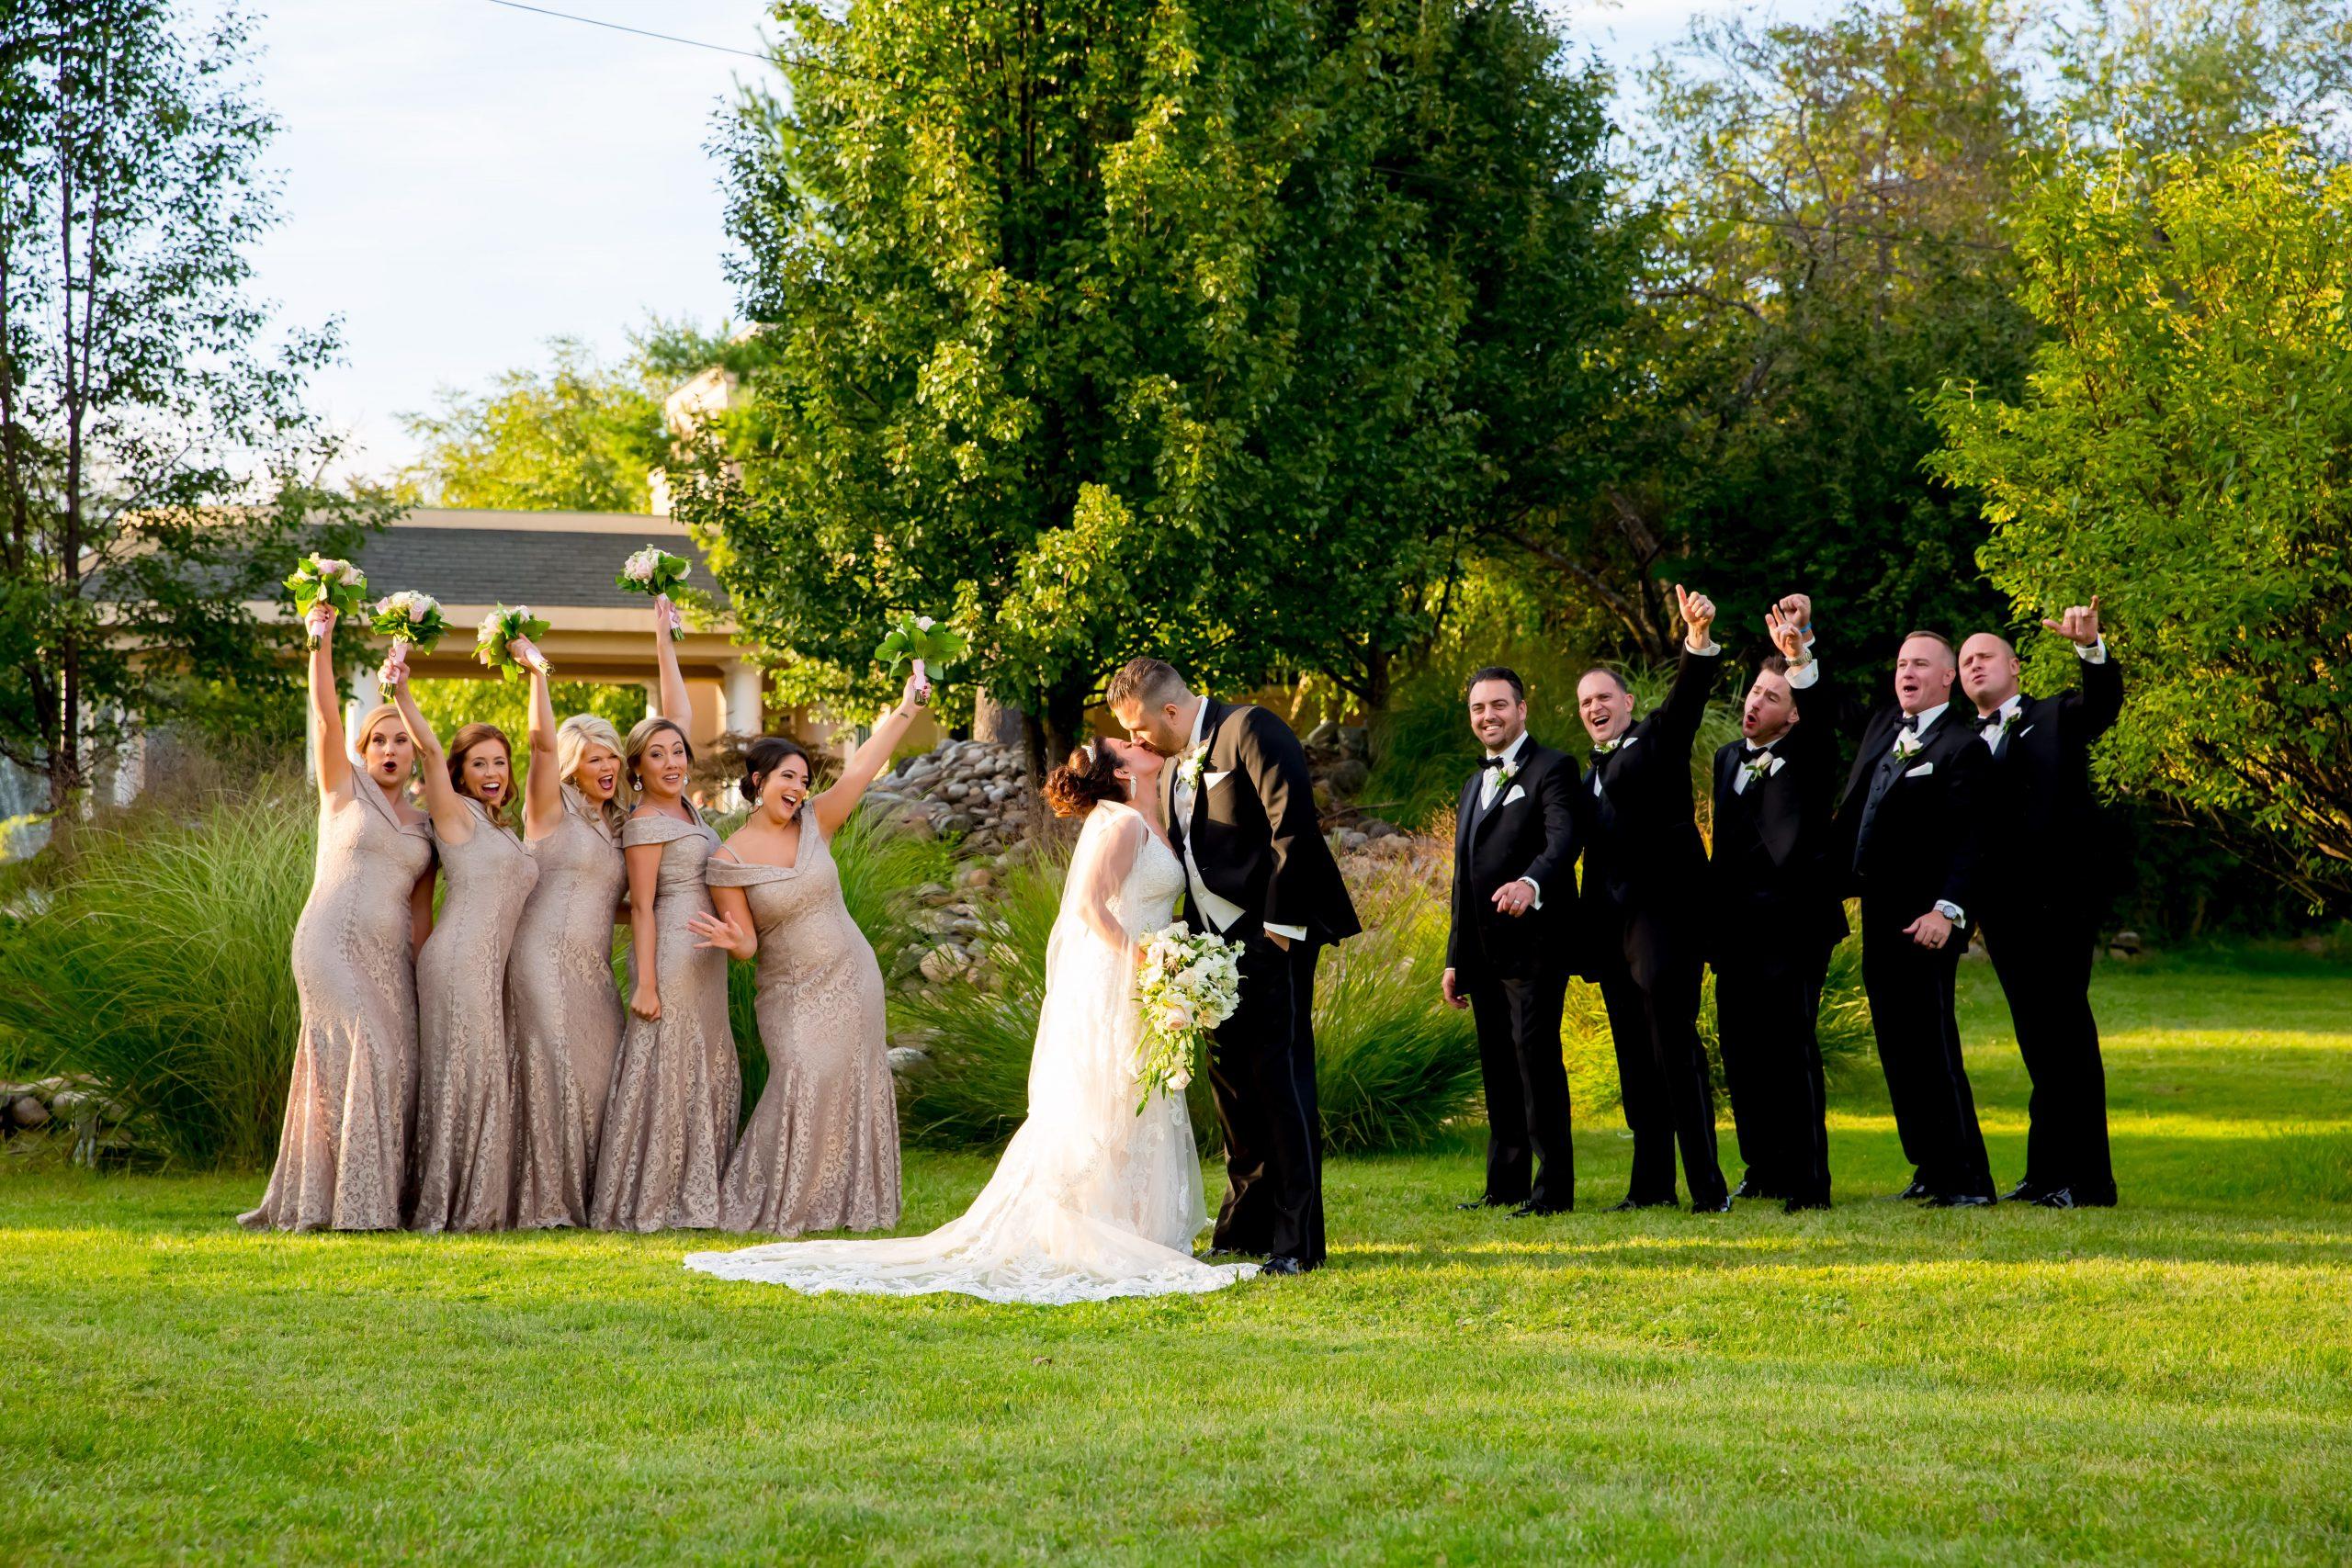 Victori_Rob_Mohawk River Country Club Wedding-34.jpg